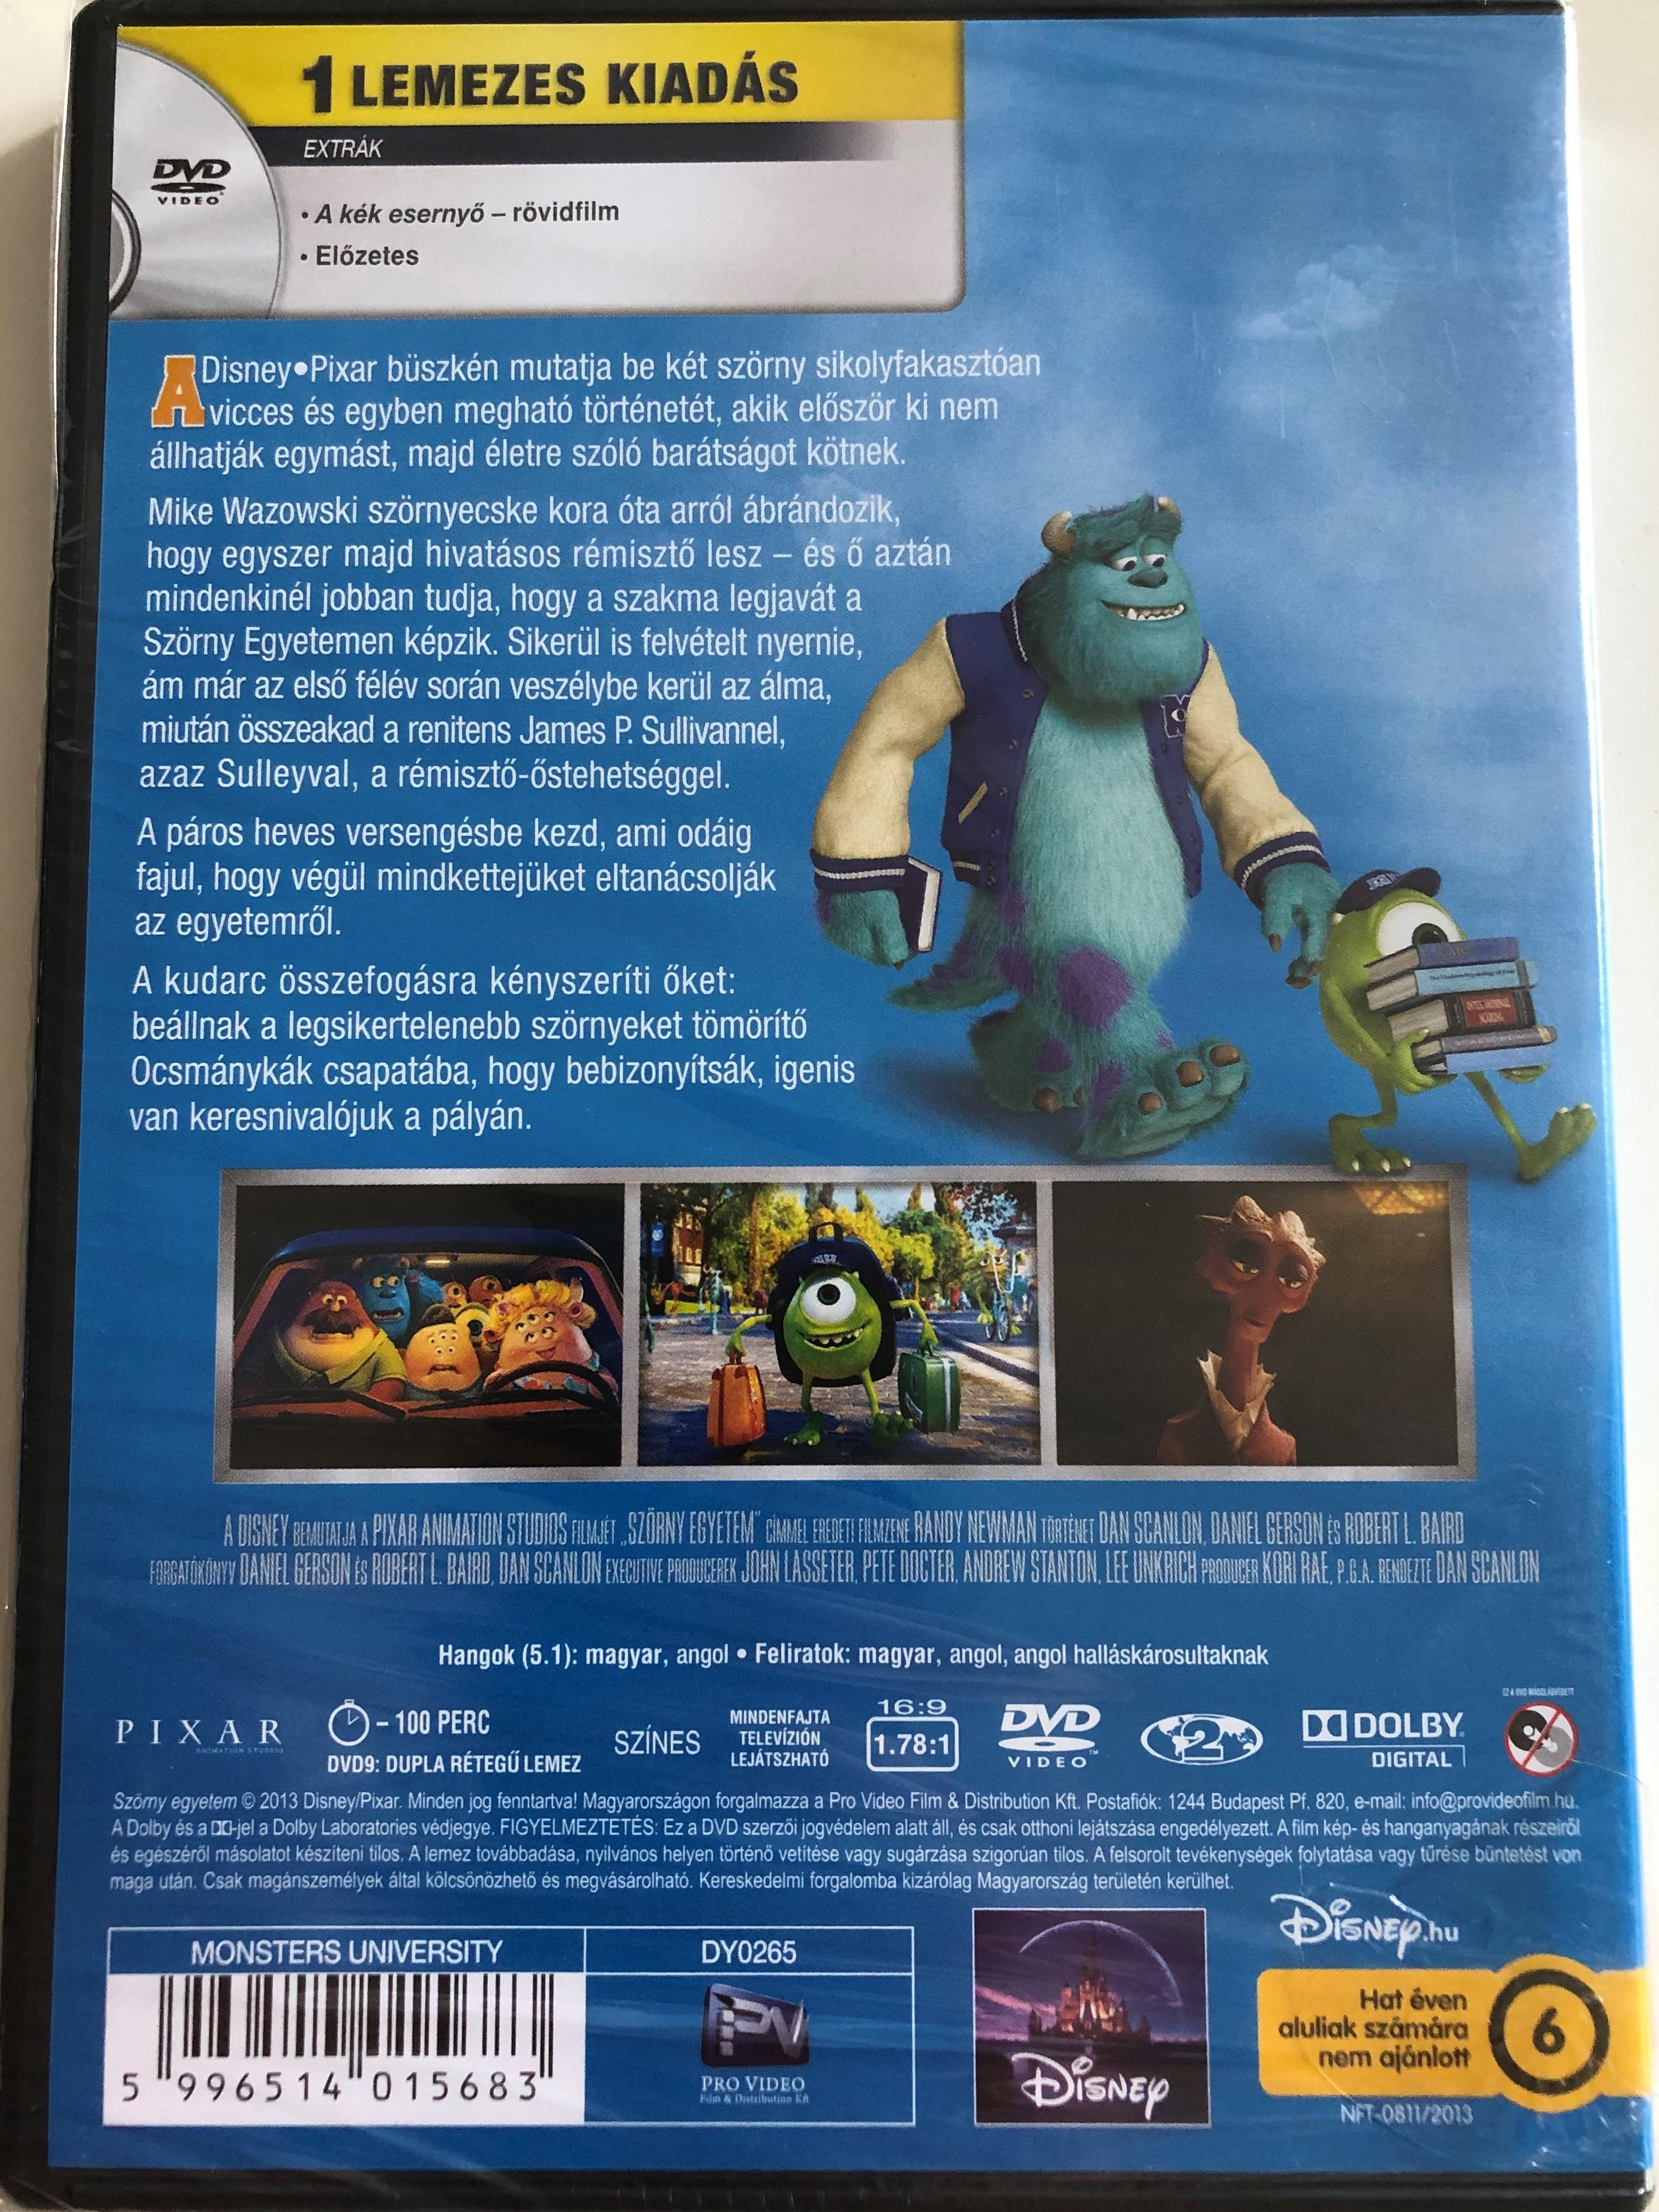 monsters-university-dvd-2013-sz-rny-egyetem-directed-by-dan-scanlon-starring-billy-crystal-john-goodman-steve-buscemi-kelsey-grammer-jennifer-tilly-2-.jpg